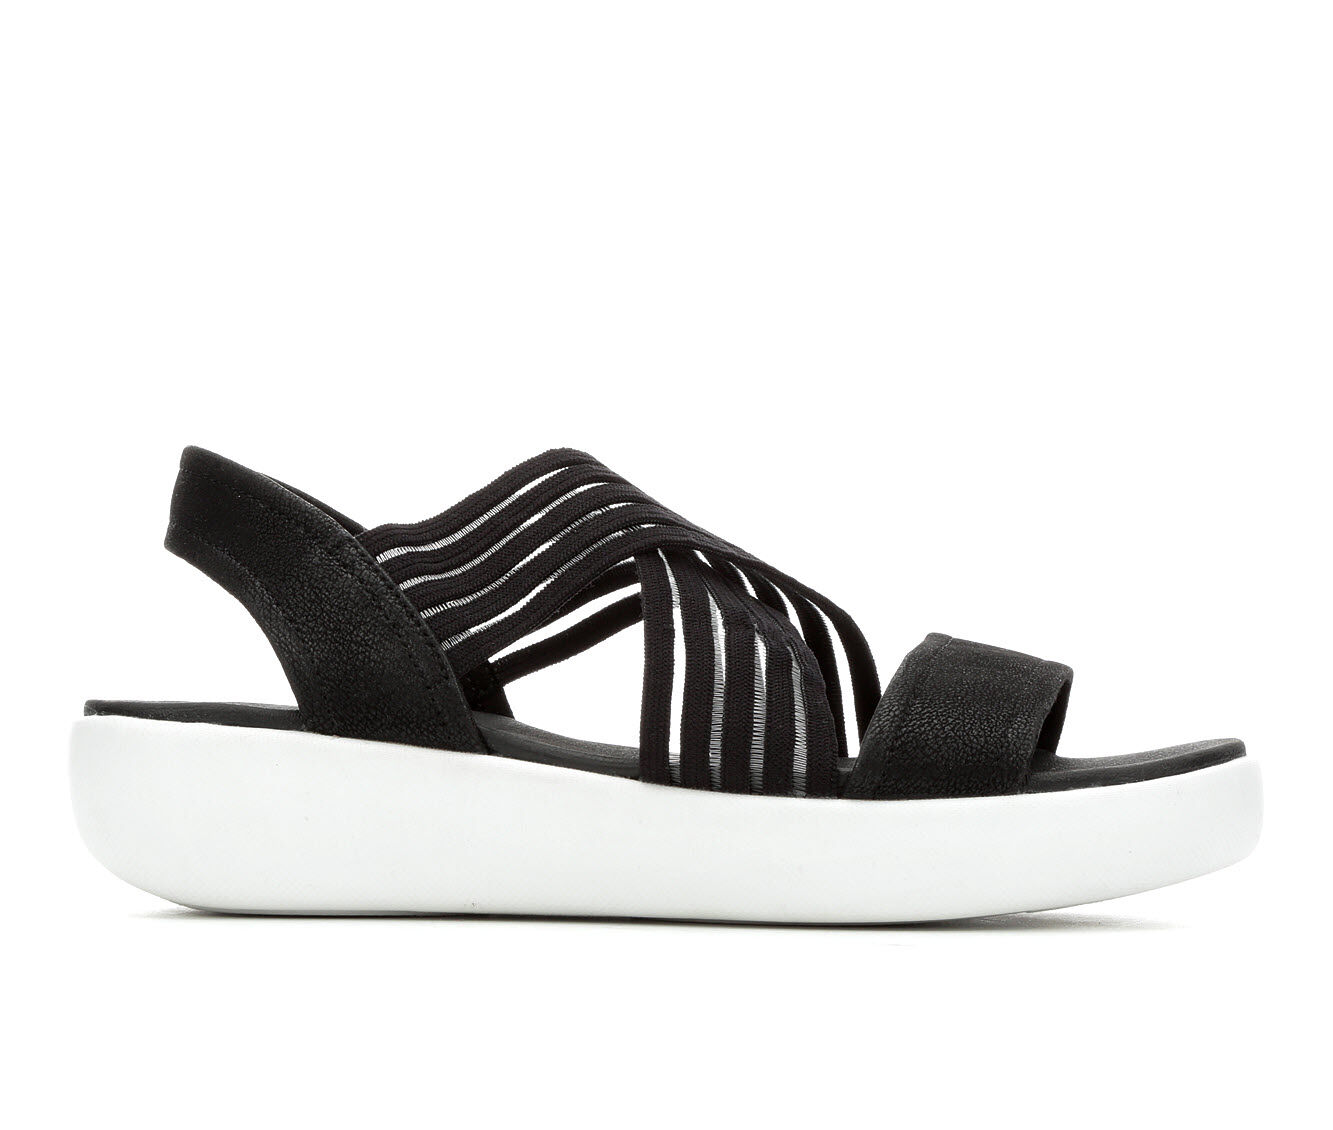 uk shoes_kd7404